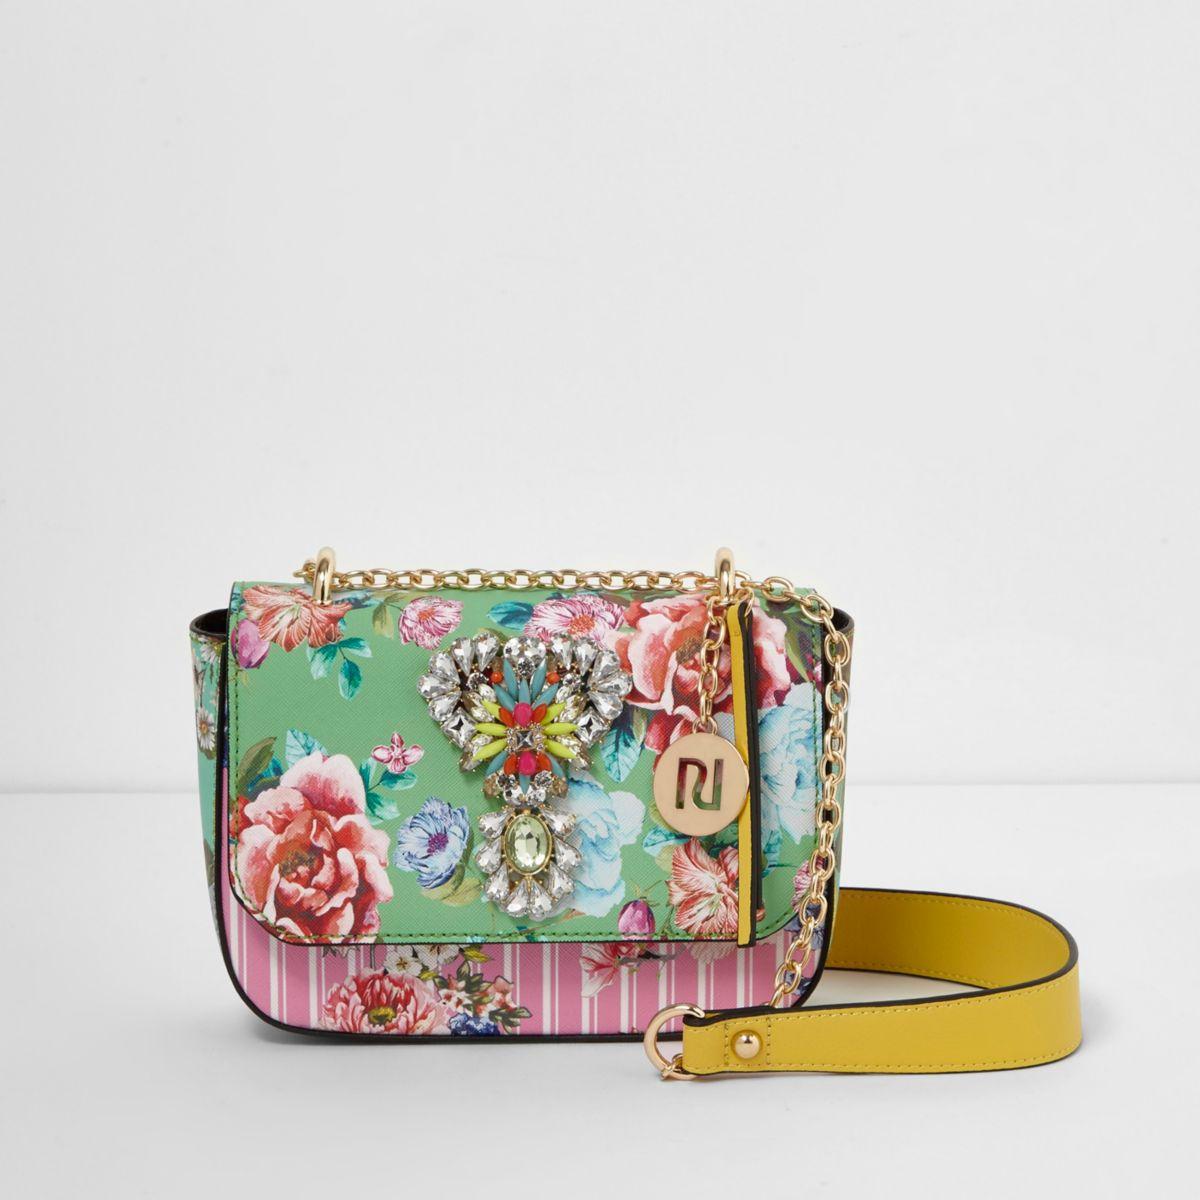 Green Floral Jewel Embellished Chain Bag - Cross Body Bags - Bags U0026 Purses - Women